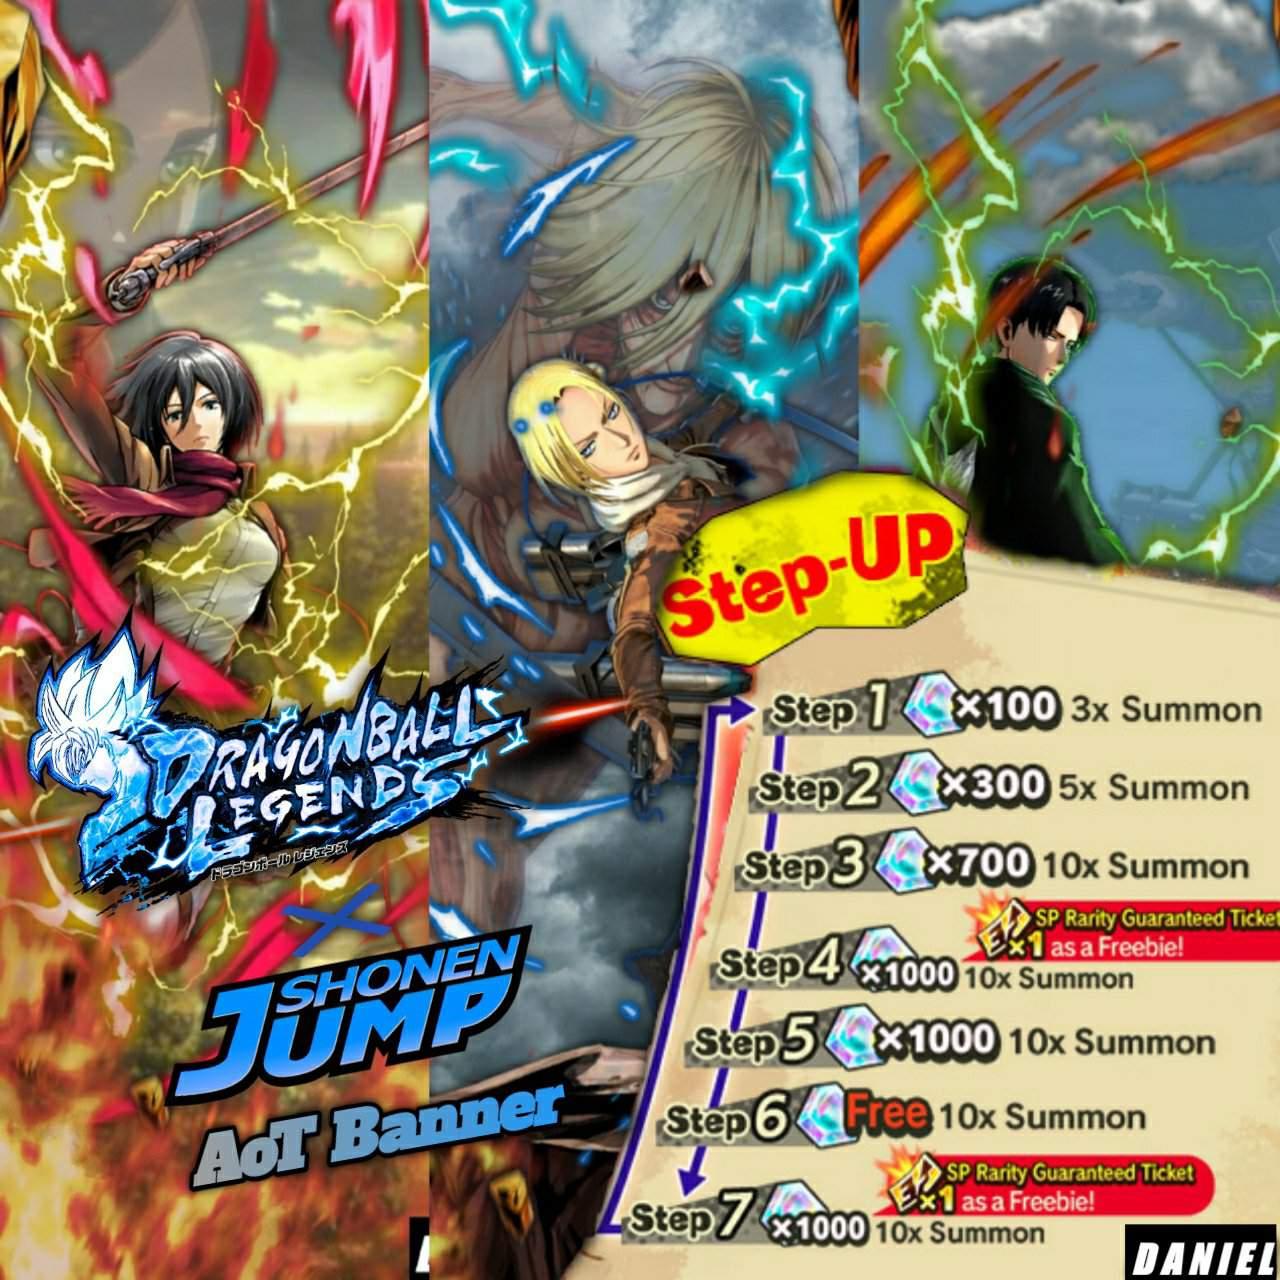 Legends X Shonen Jump Collab Concept Aot Edition Dragon Ball Legends Amino